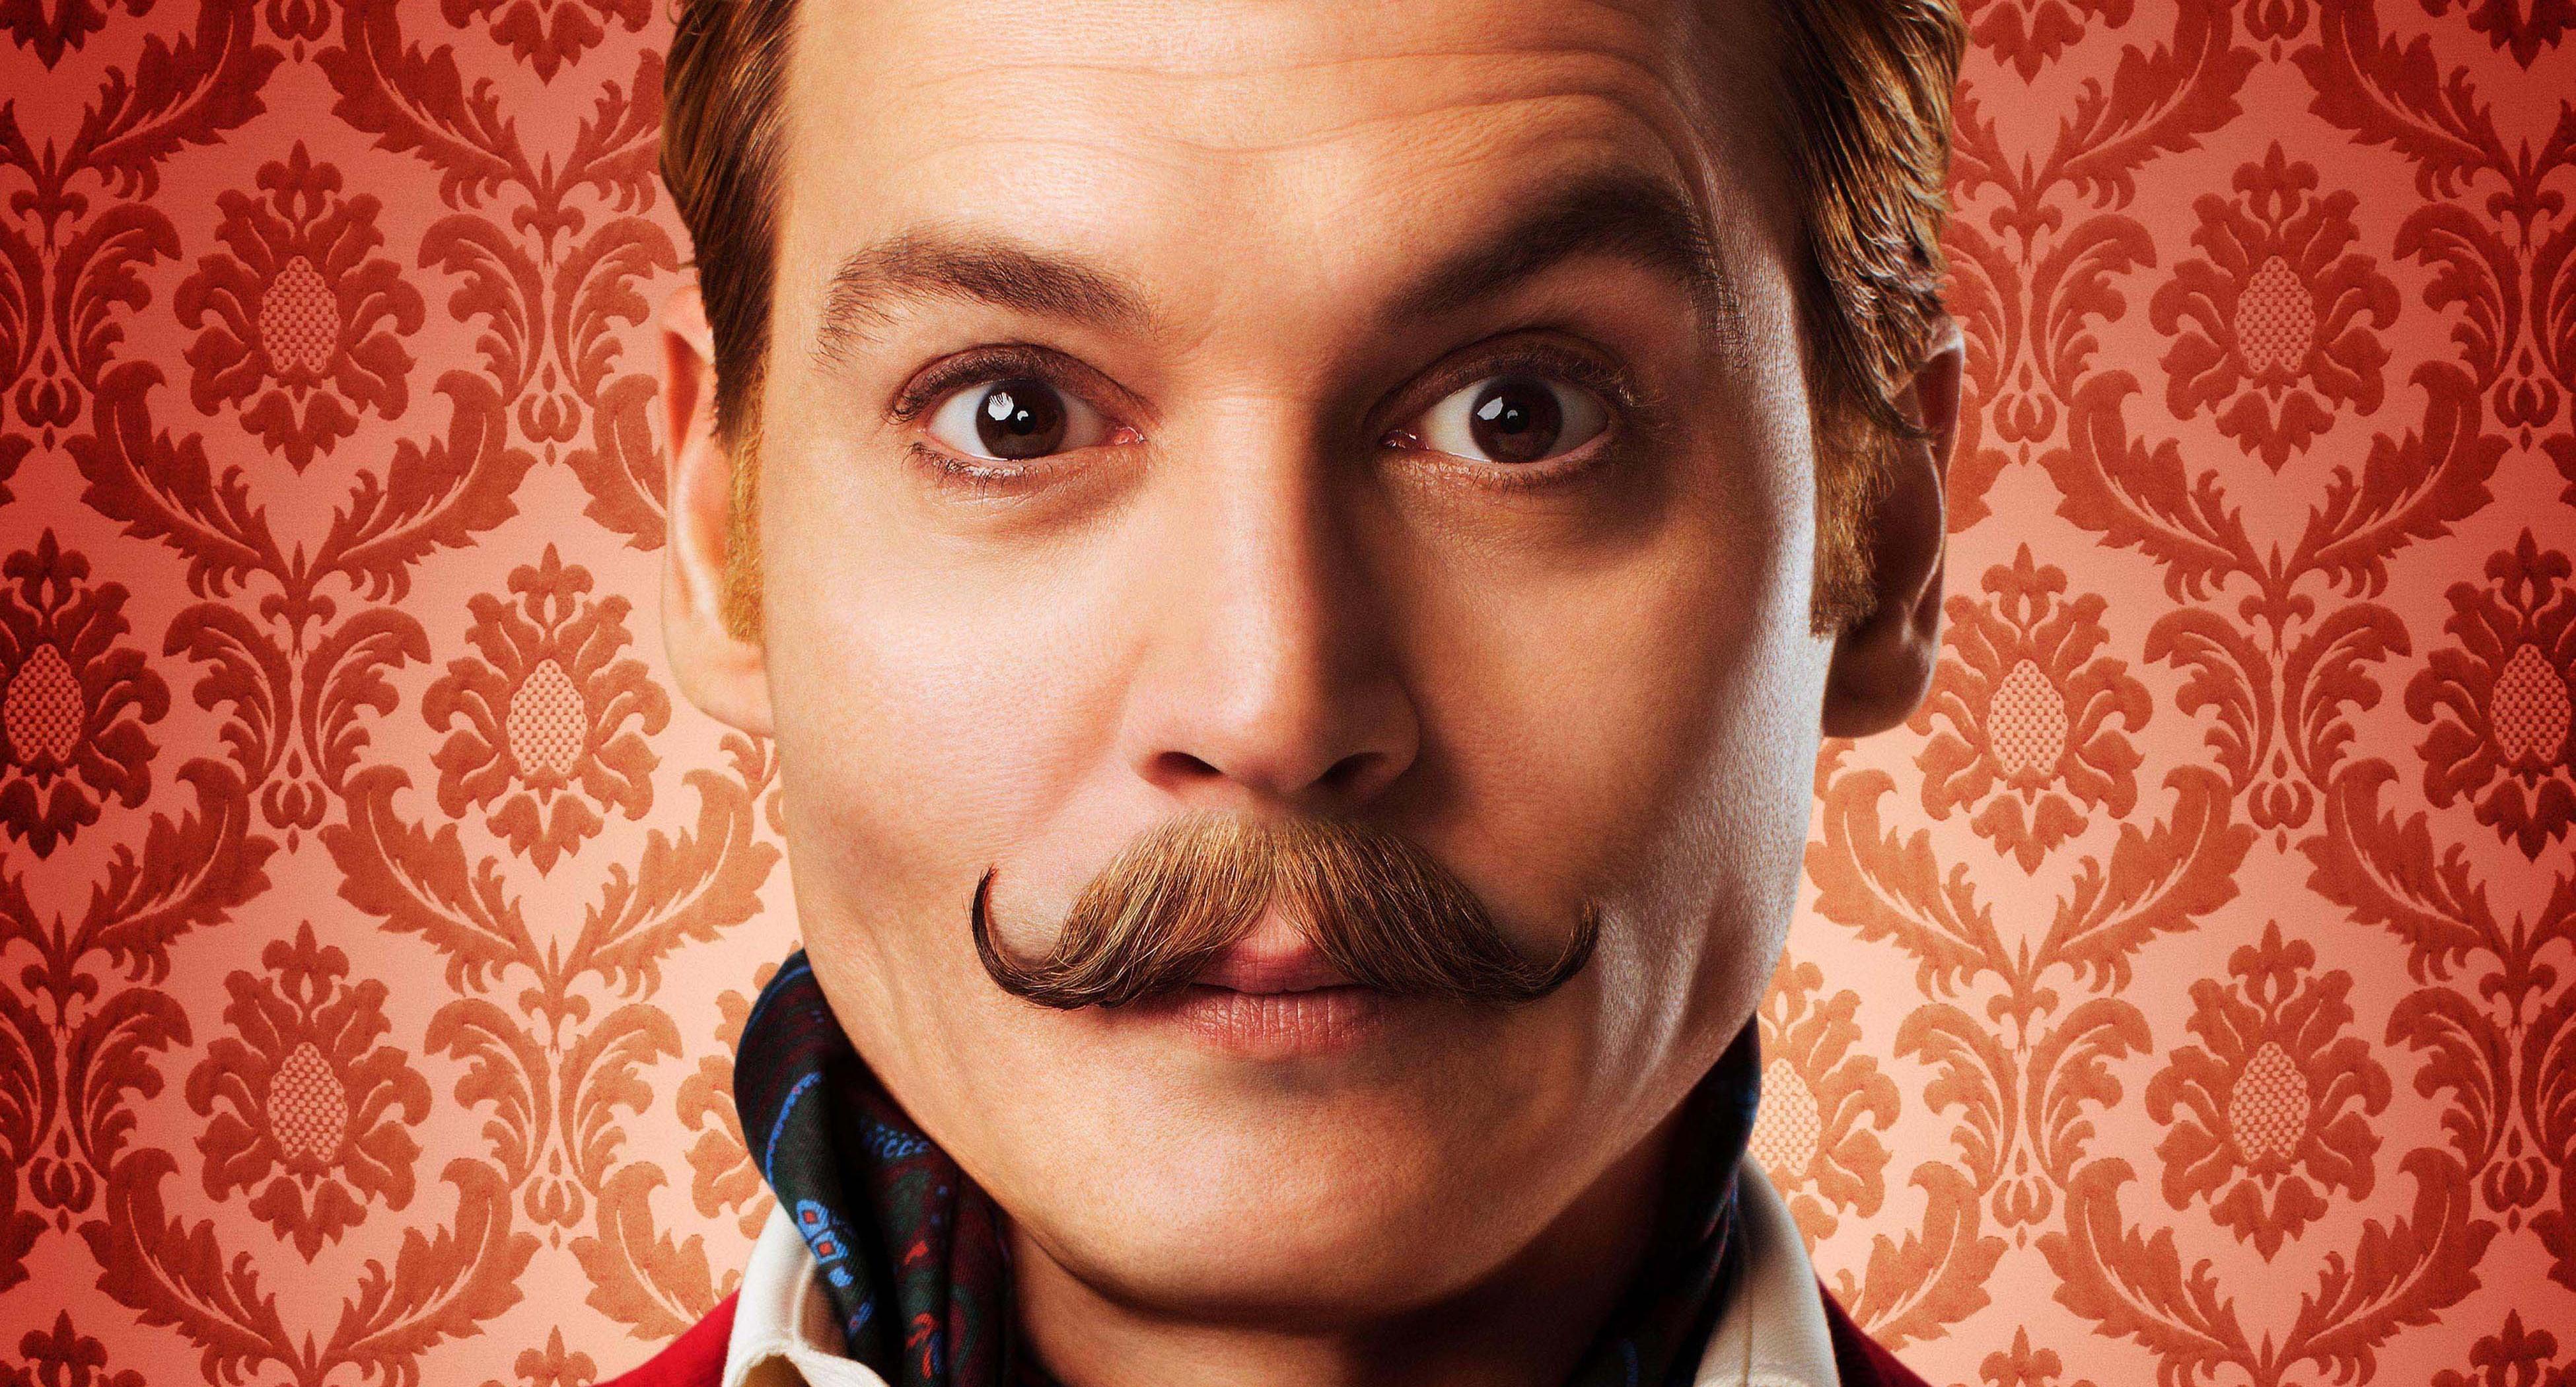 Wallpaper Mortdecai 2015 Film Movie Red Johnny Depp